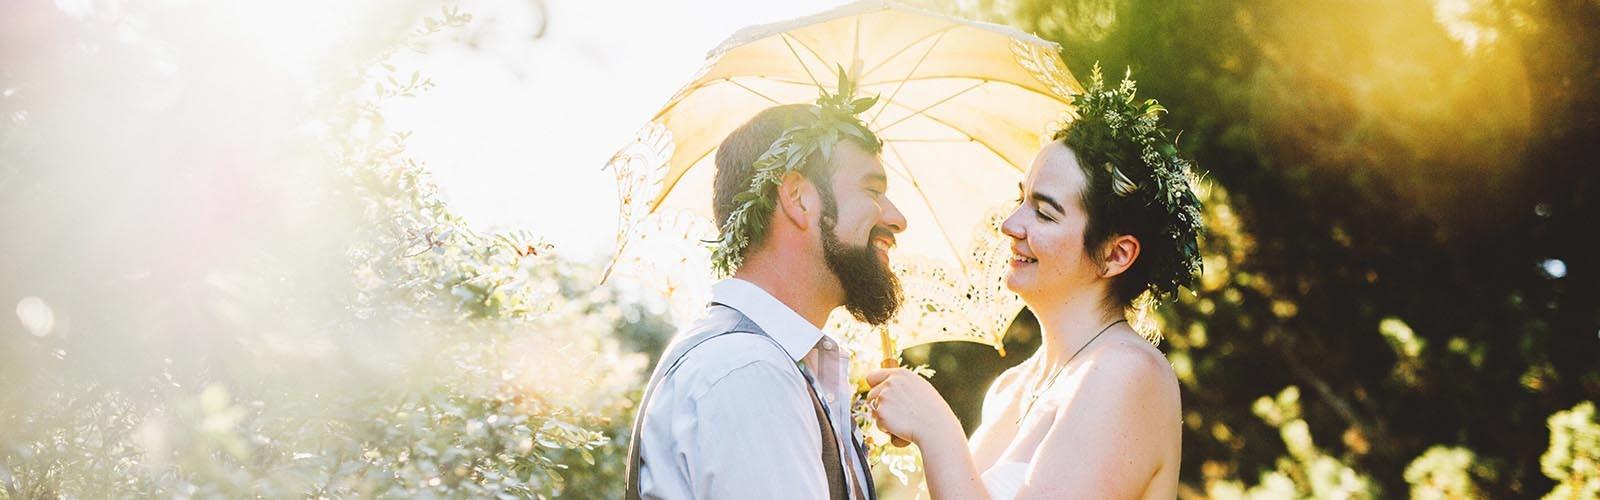 Melinda & Louis | Portland Wedding Photographer